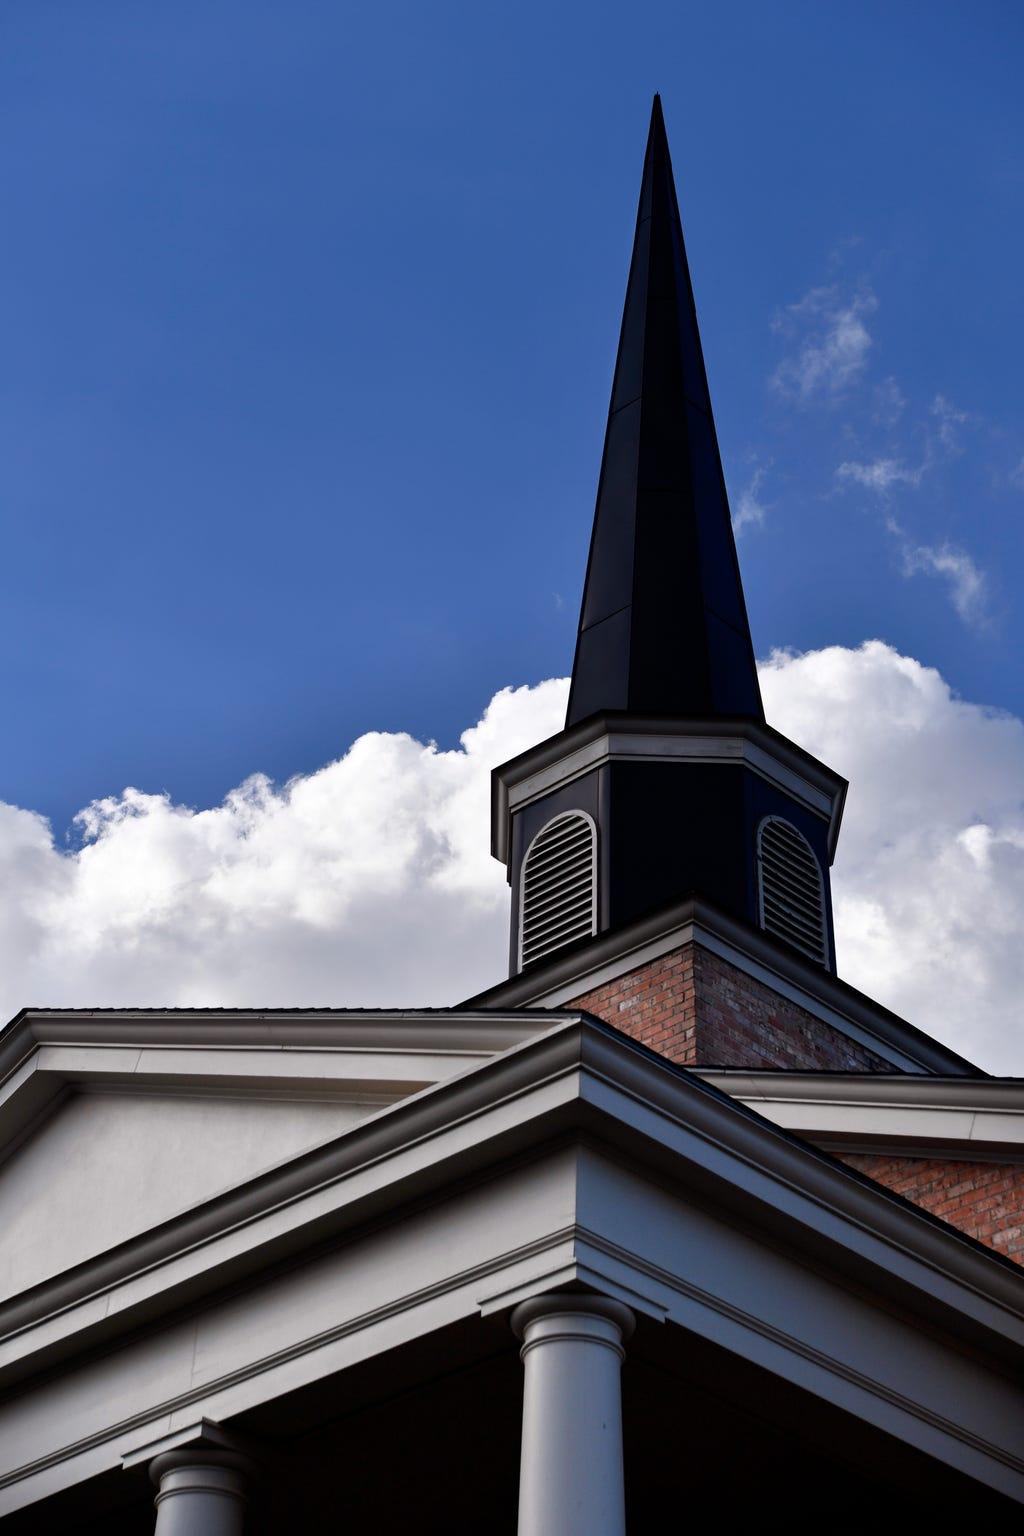 The First Christian Church steeple.